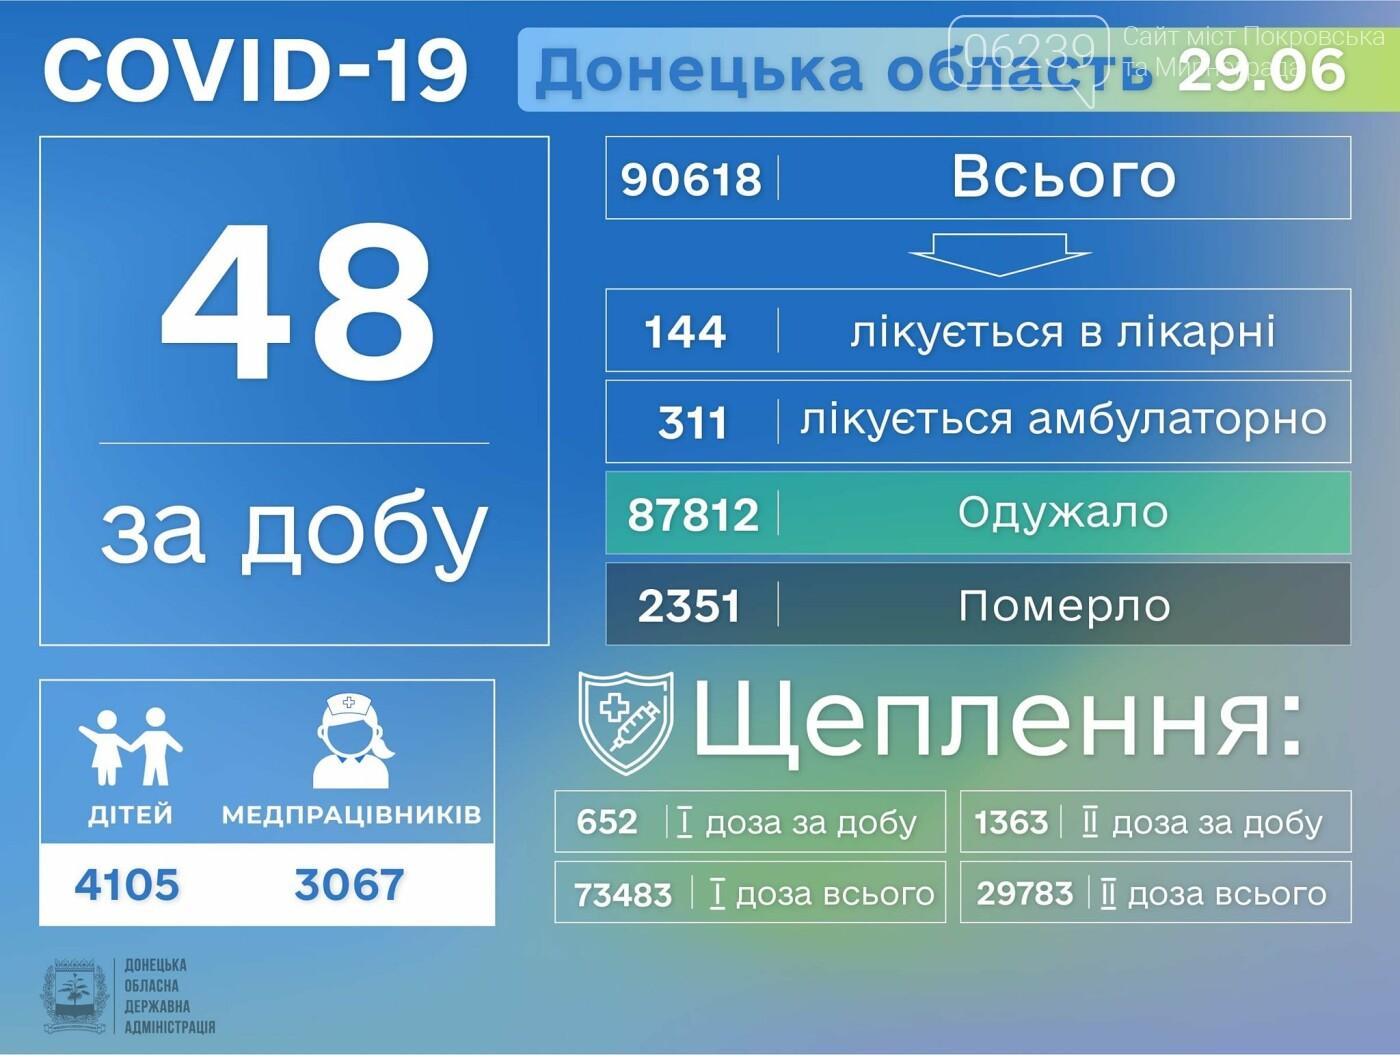 Covid-19 забрав 3 життя на Донеччині, фото-1